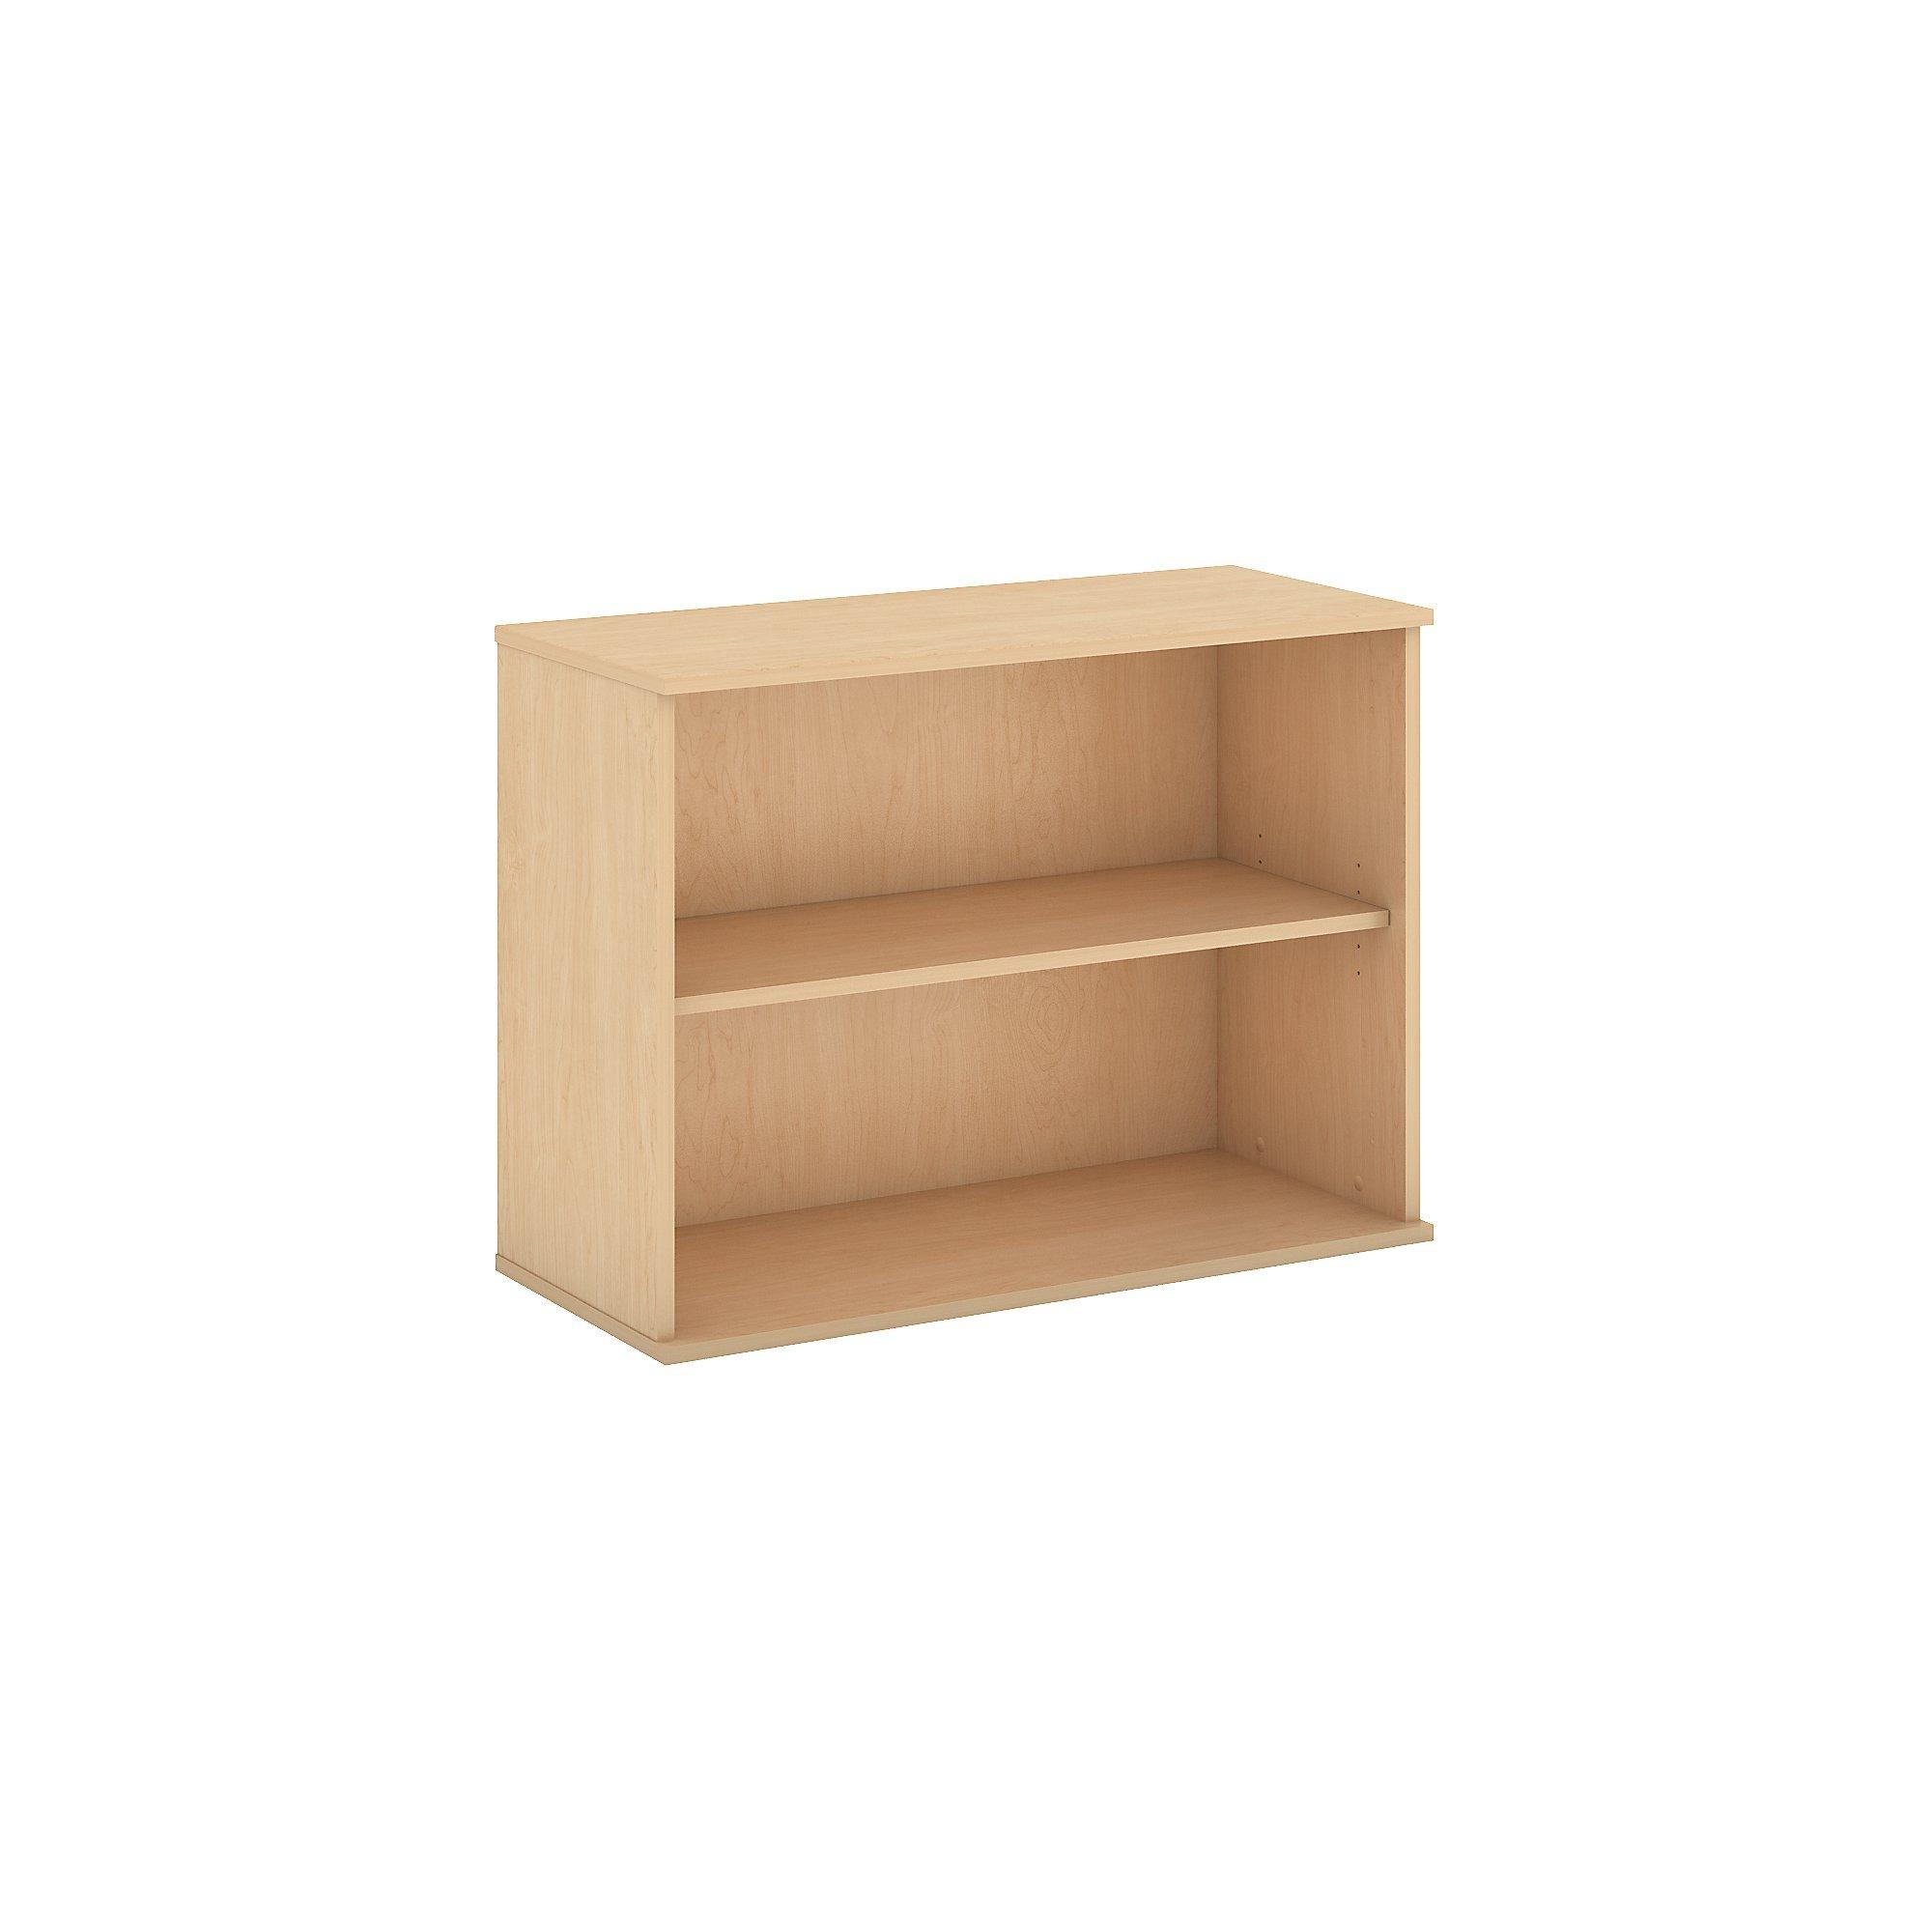 30H 2 Shelf Bookcase in Natural Maple